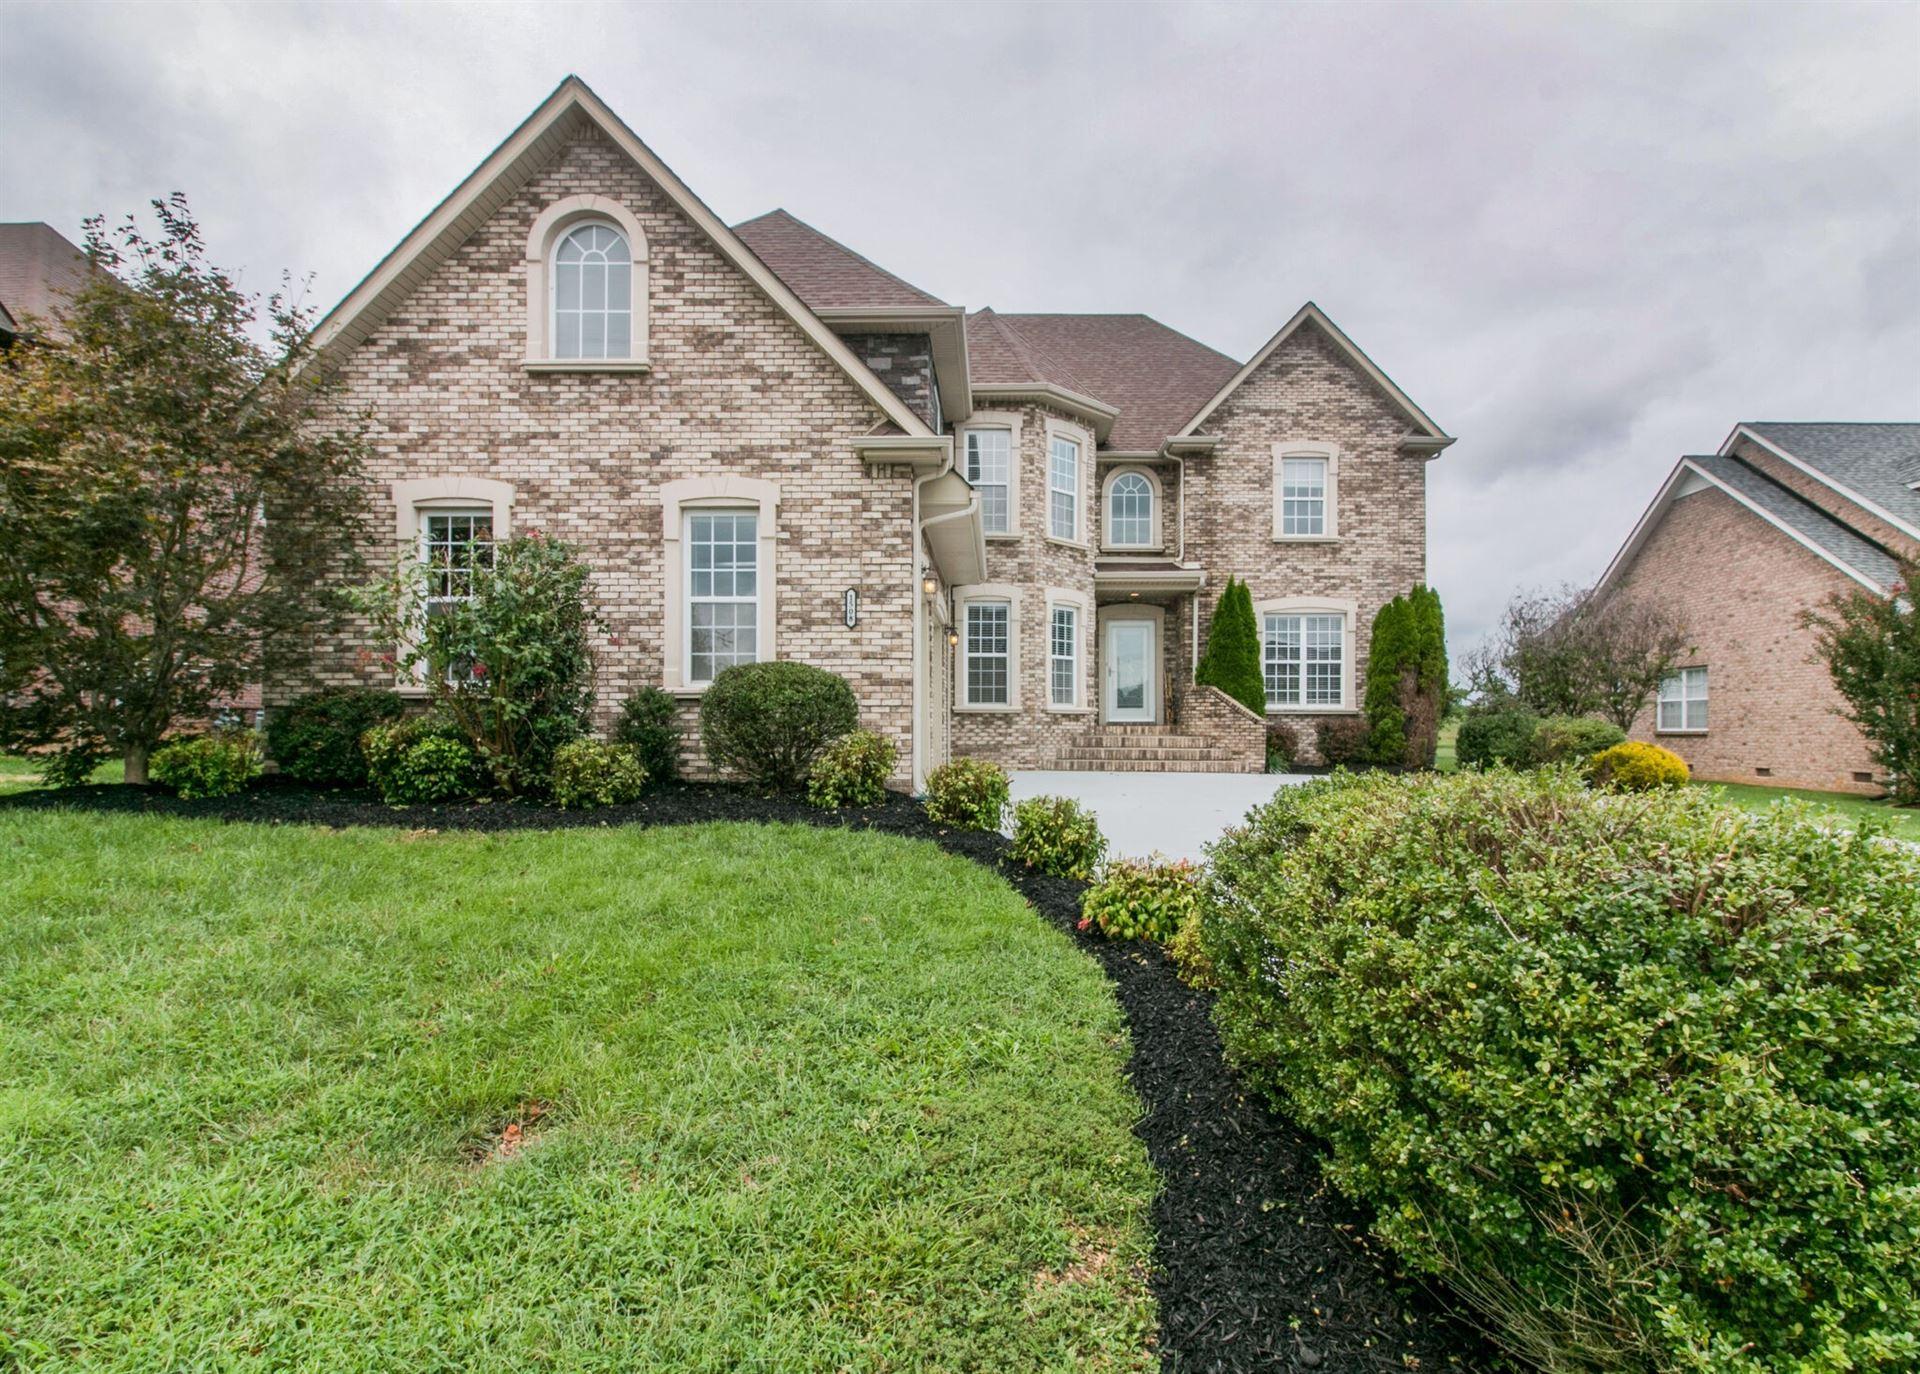 1508 Edgewater Ln, Clarksville, TN 37043 - MLS#: 2184349